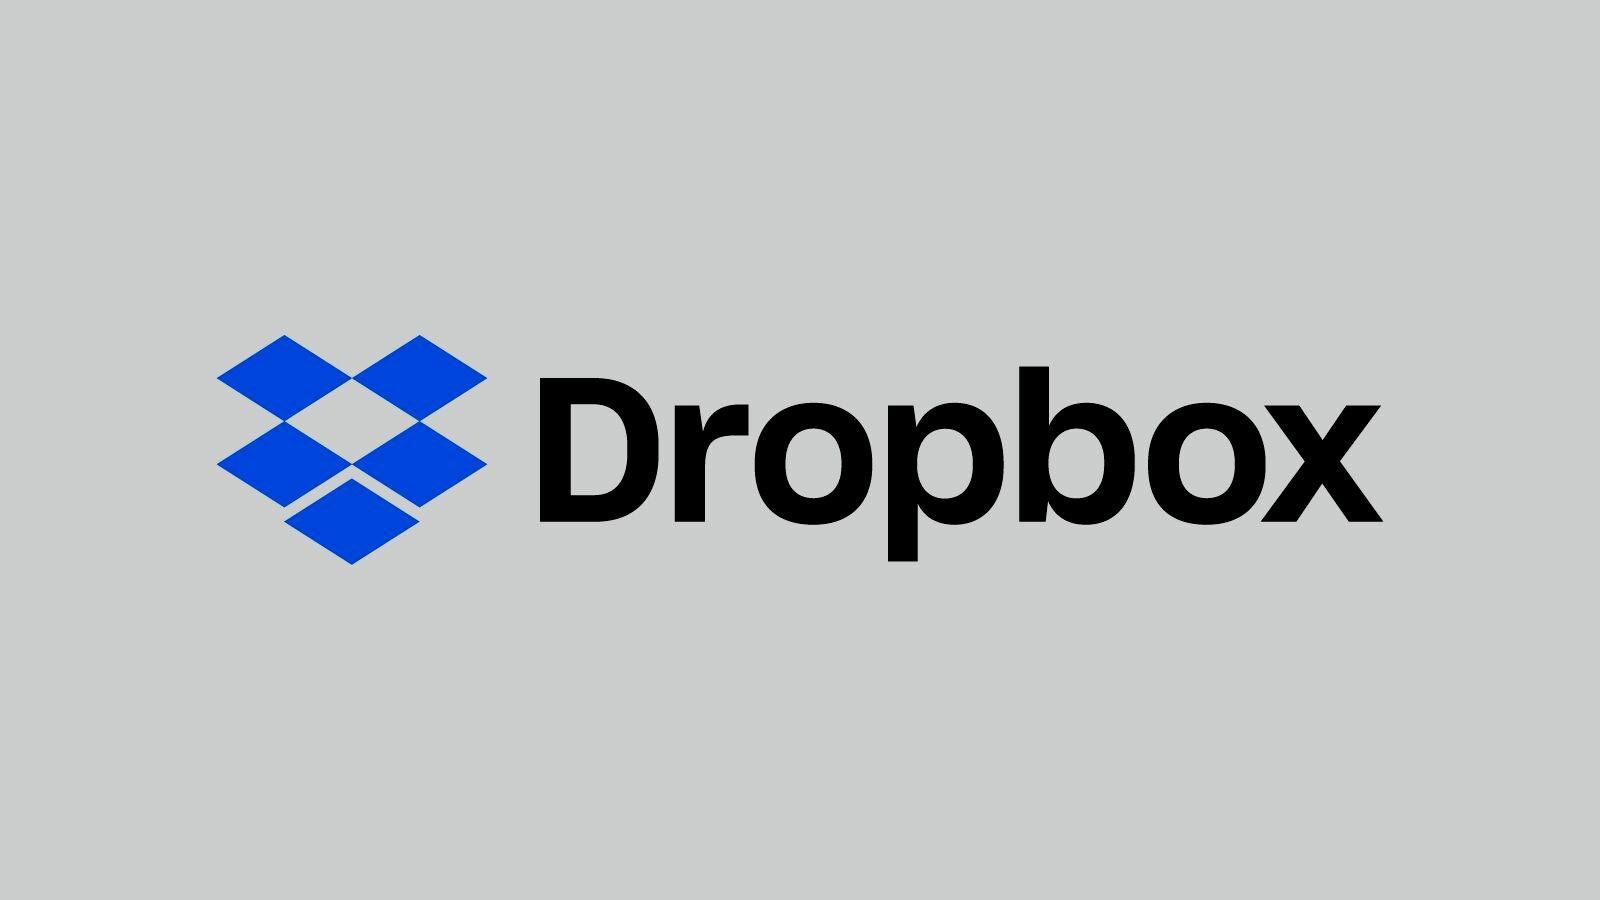 dropbox-logo%402x.jpg